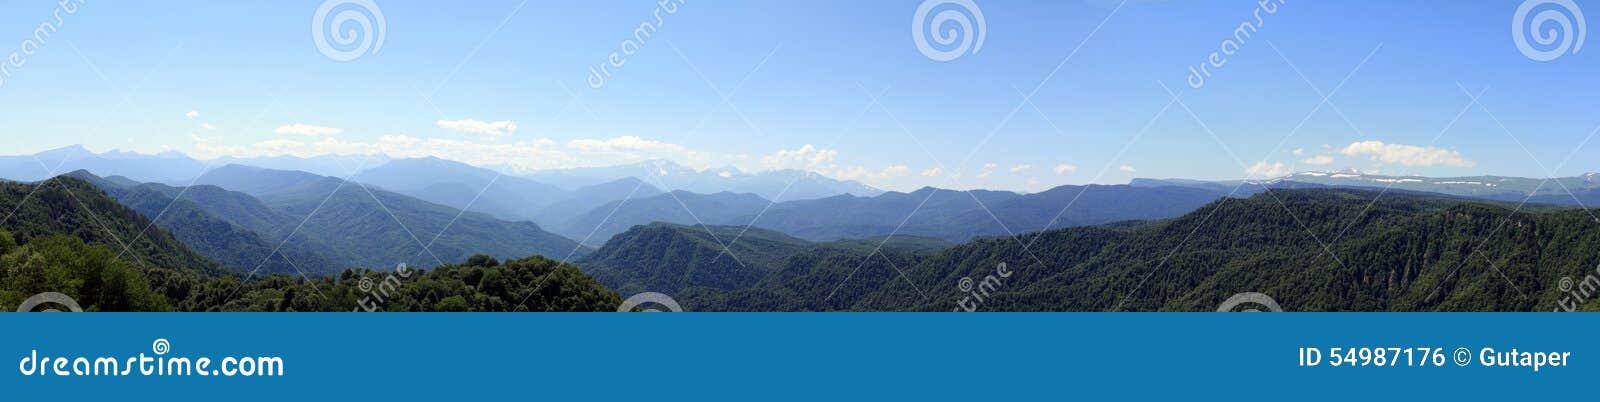 Sommar i bergen